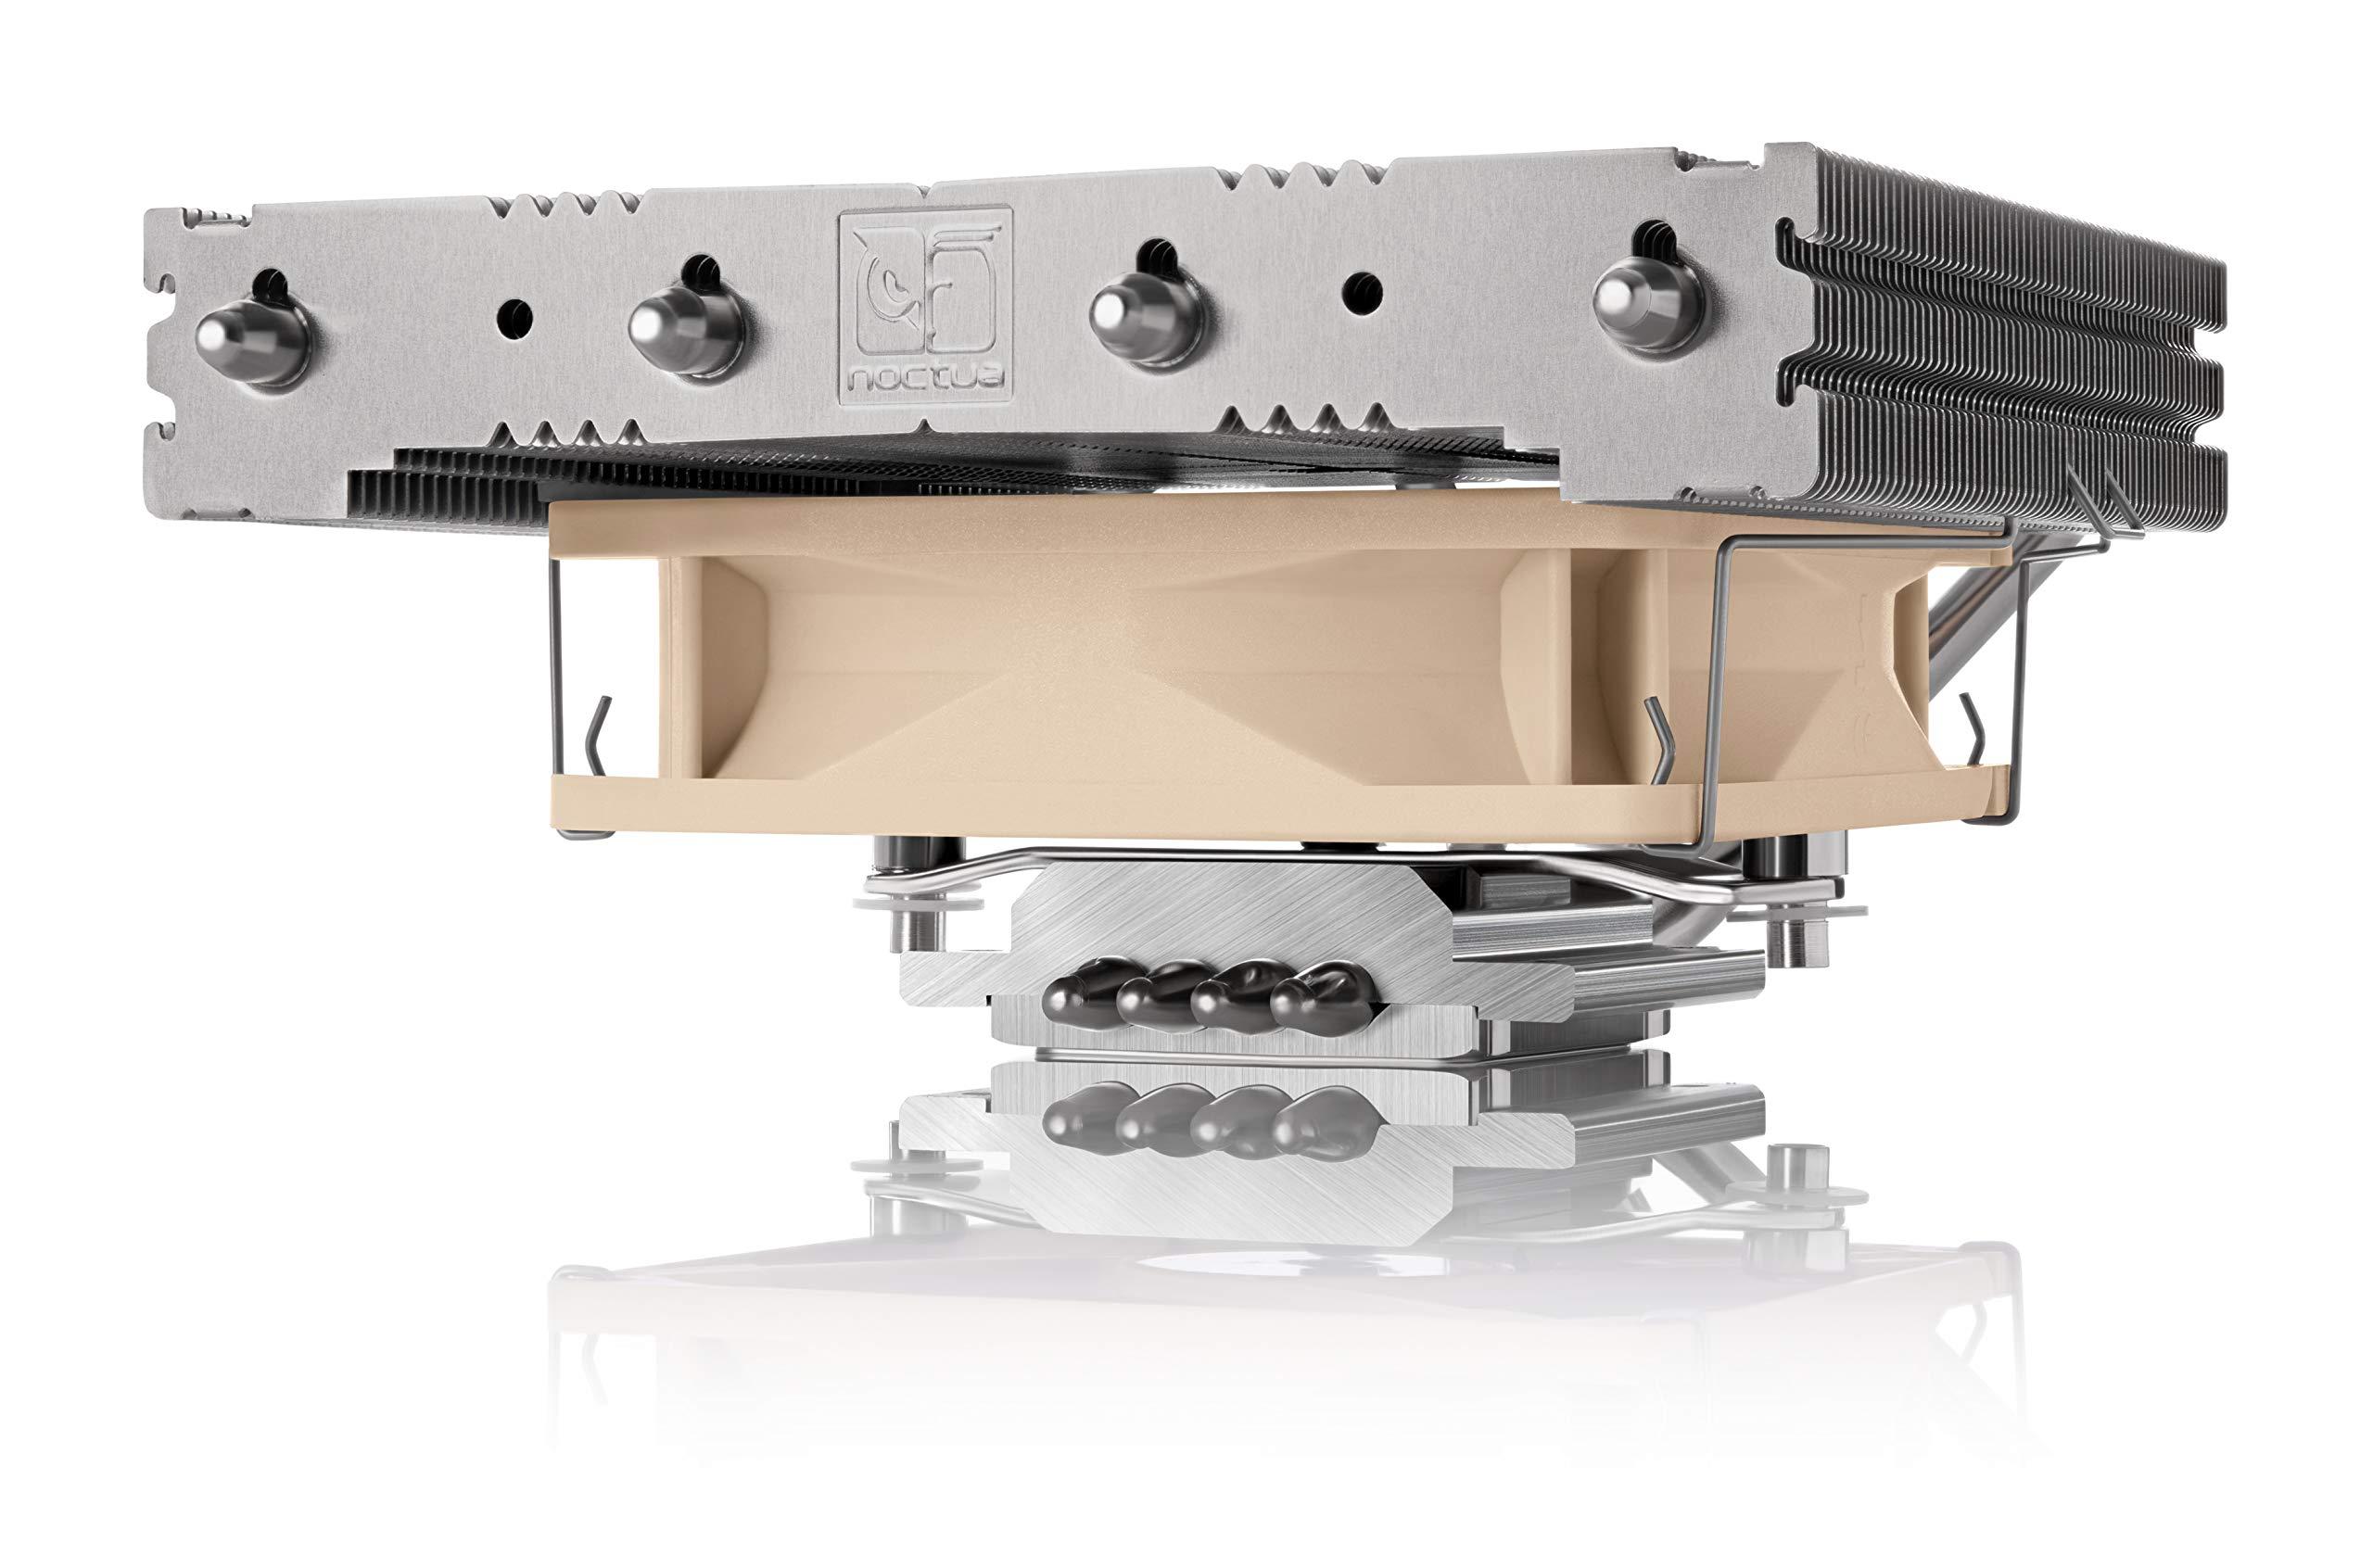 CPU Cooler Noctua NH-L12 Ghost S1 Edition Premium Low Profil